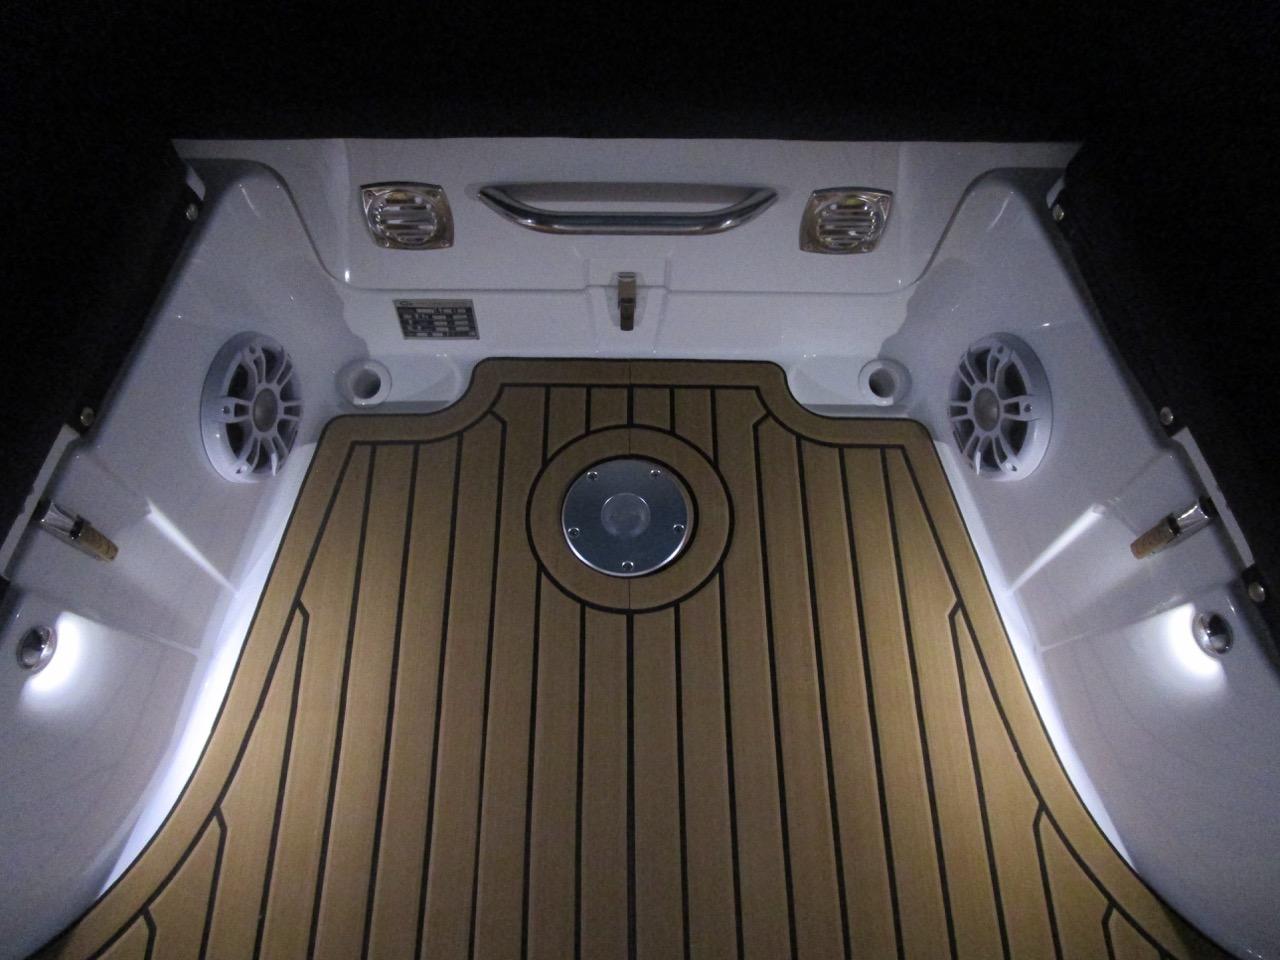 GRAND G850 RIB LED deck lights, stern